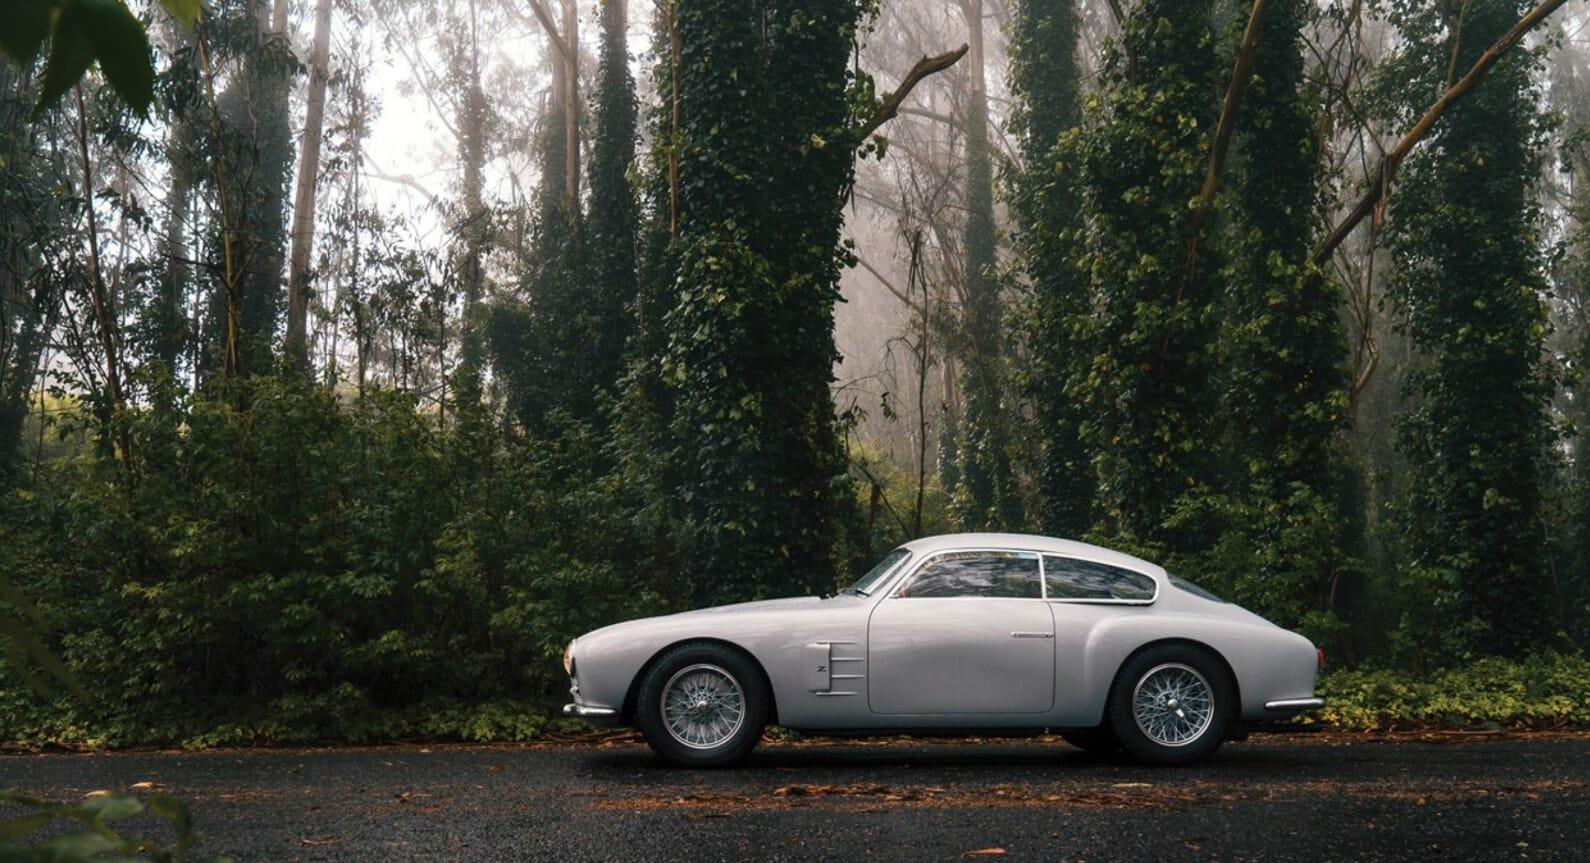 Classic Car Find Of The Week: 1956 Maserati A6G/2000